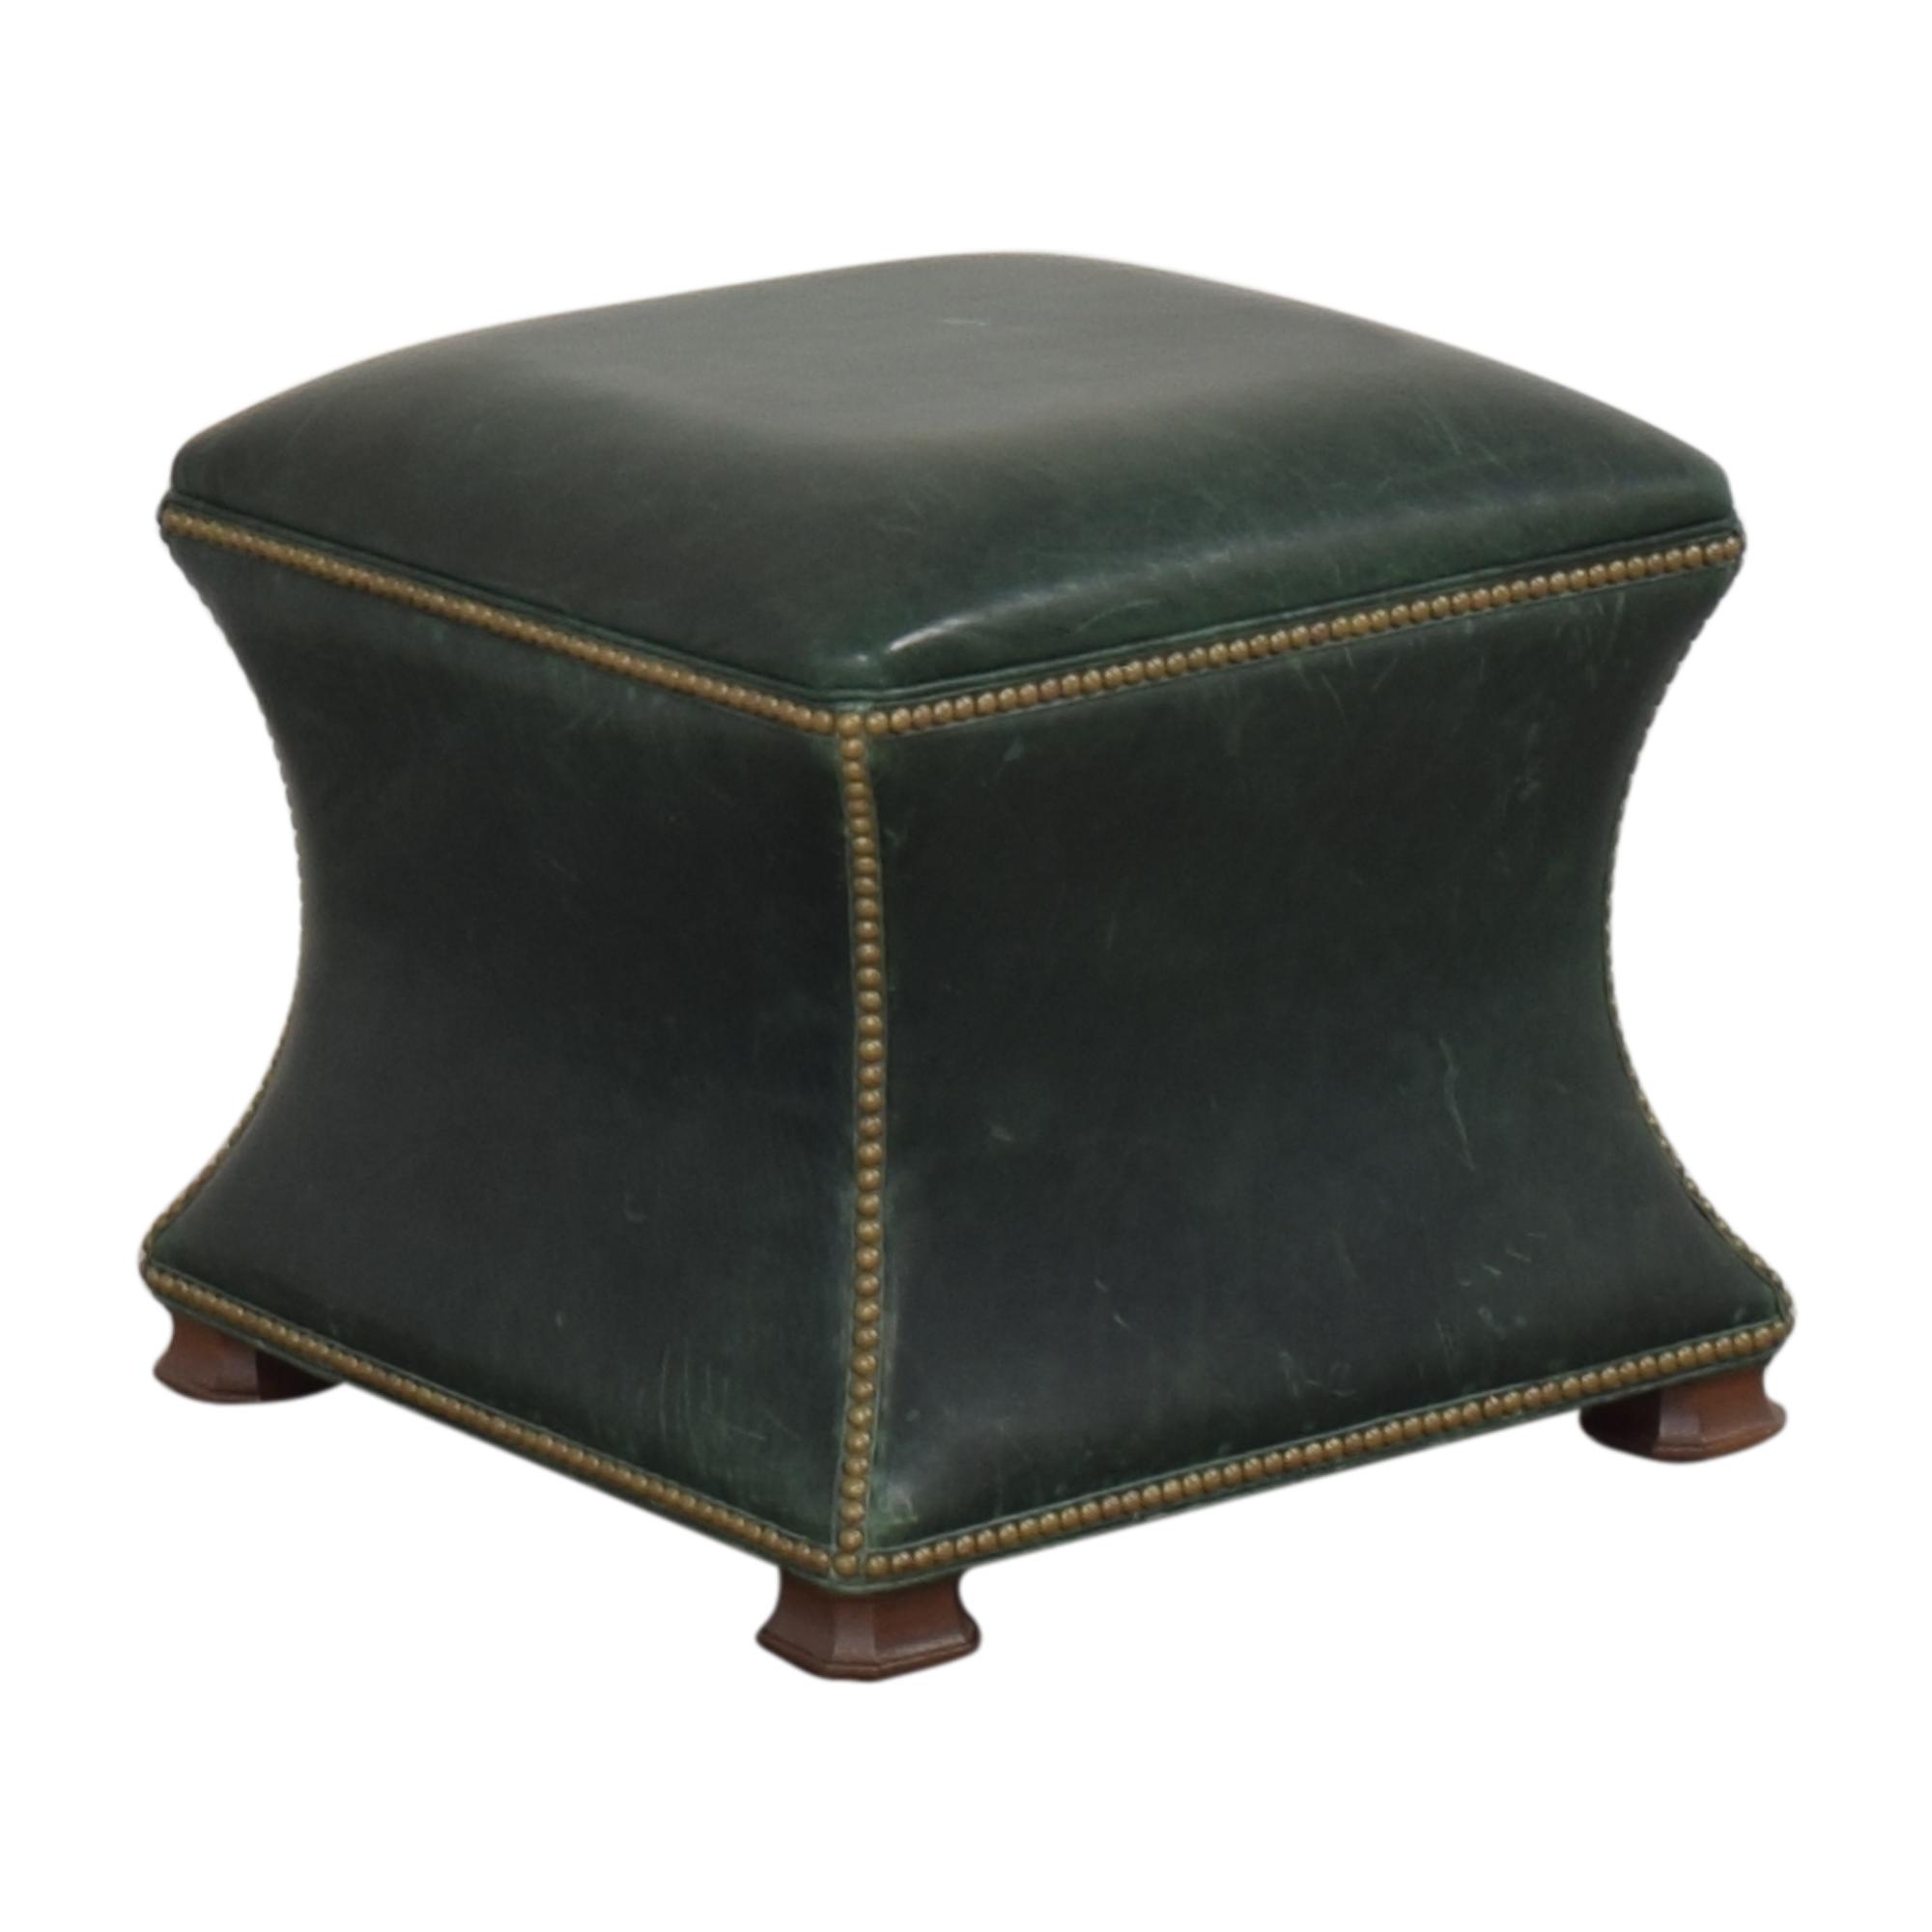 Ethan Allen Corbin Ottoman / Chairs